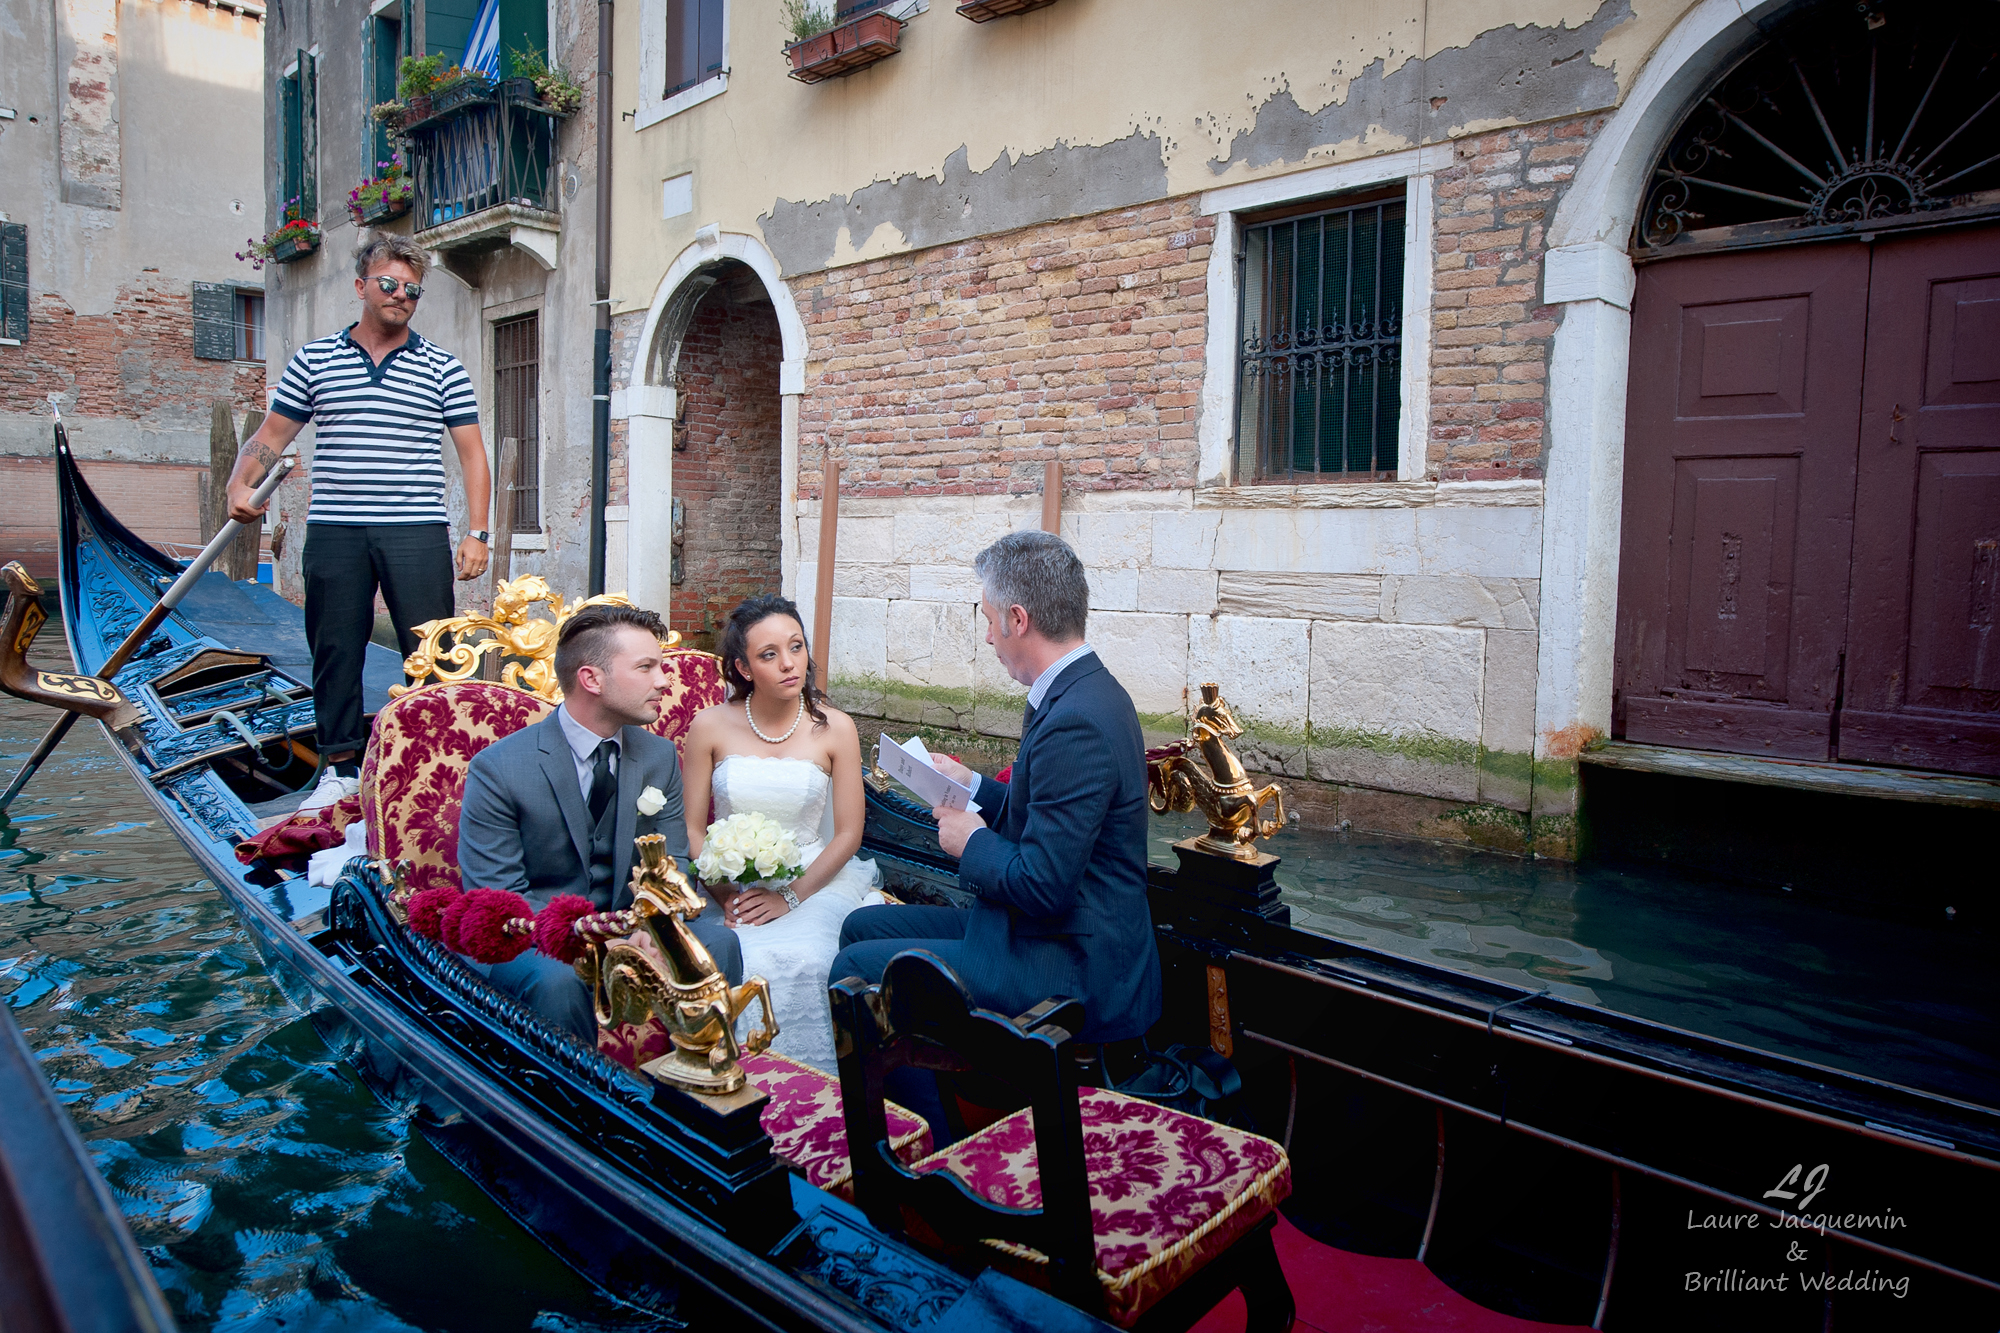 Venice Simbolic Wedding gondola venice Italy laure jacquemin photography (36) copia